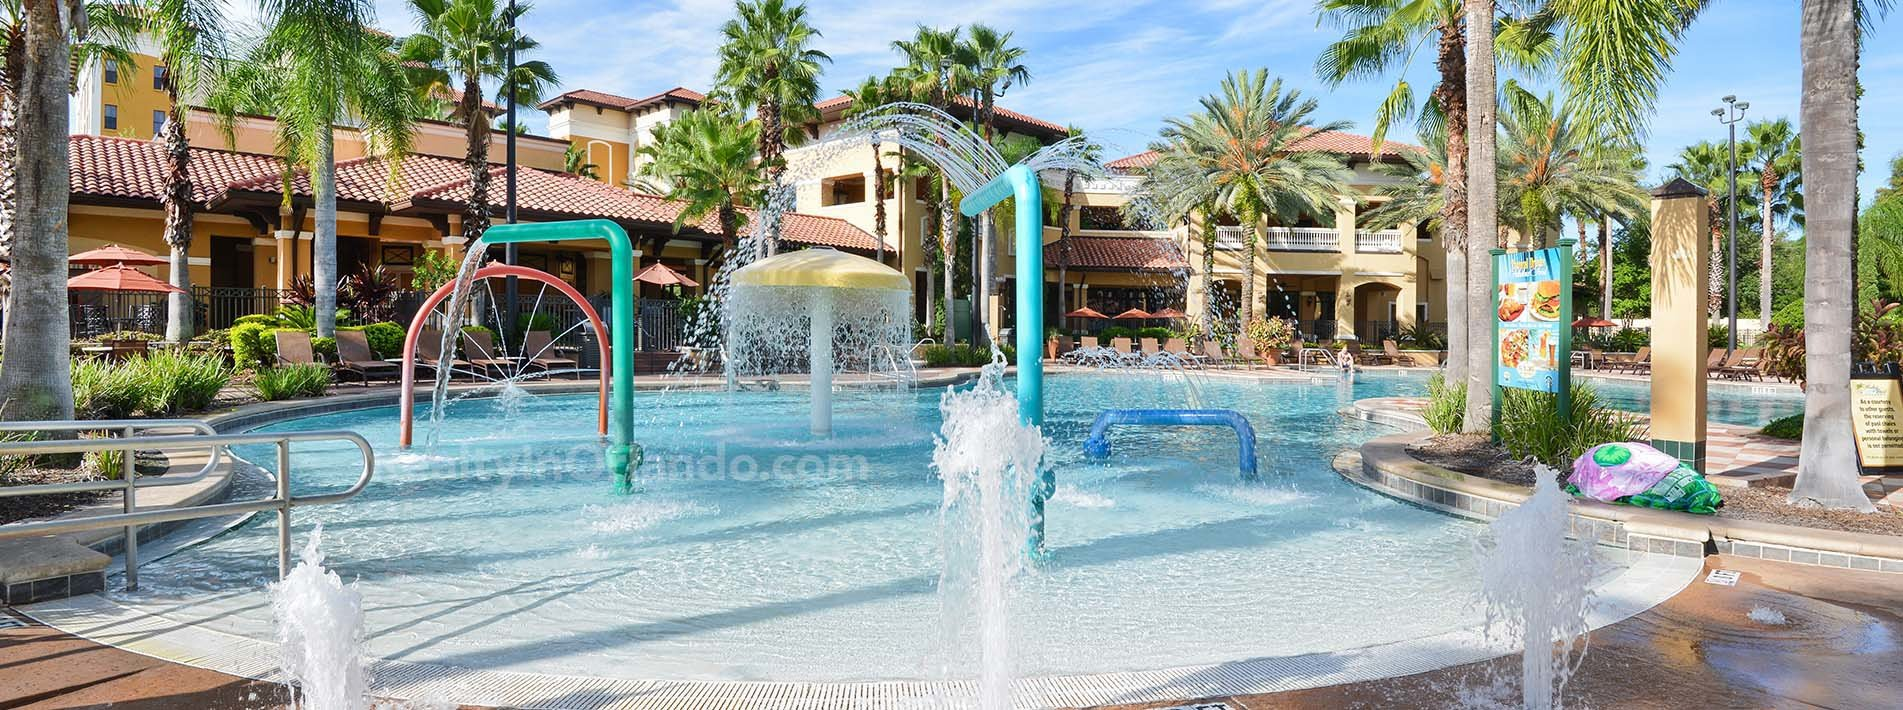 Floridays Orlando Real Estate Realty In Orlando